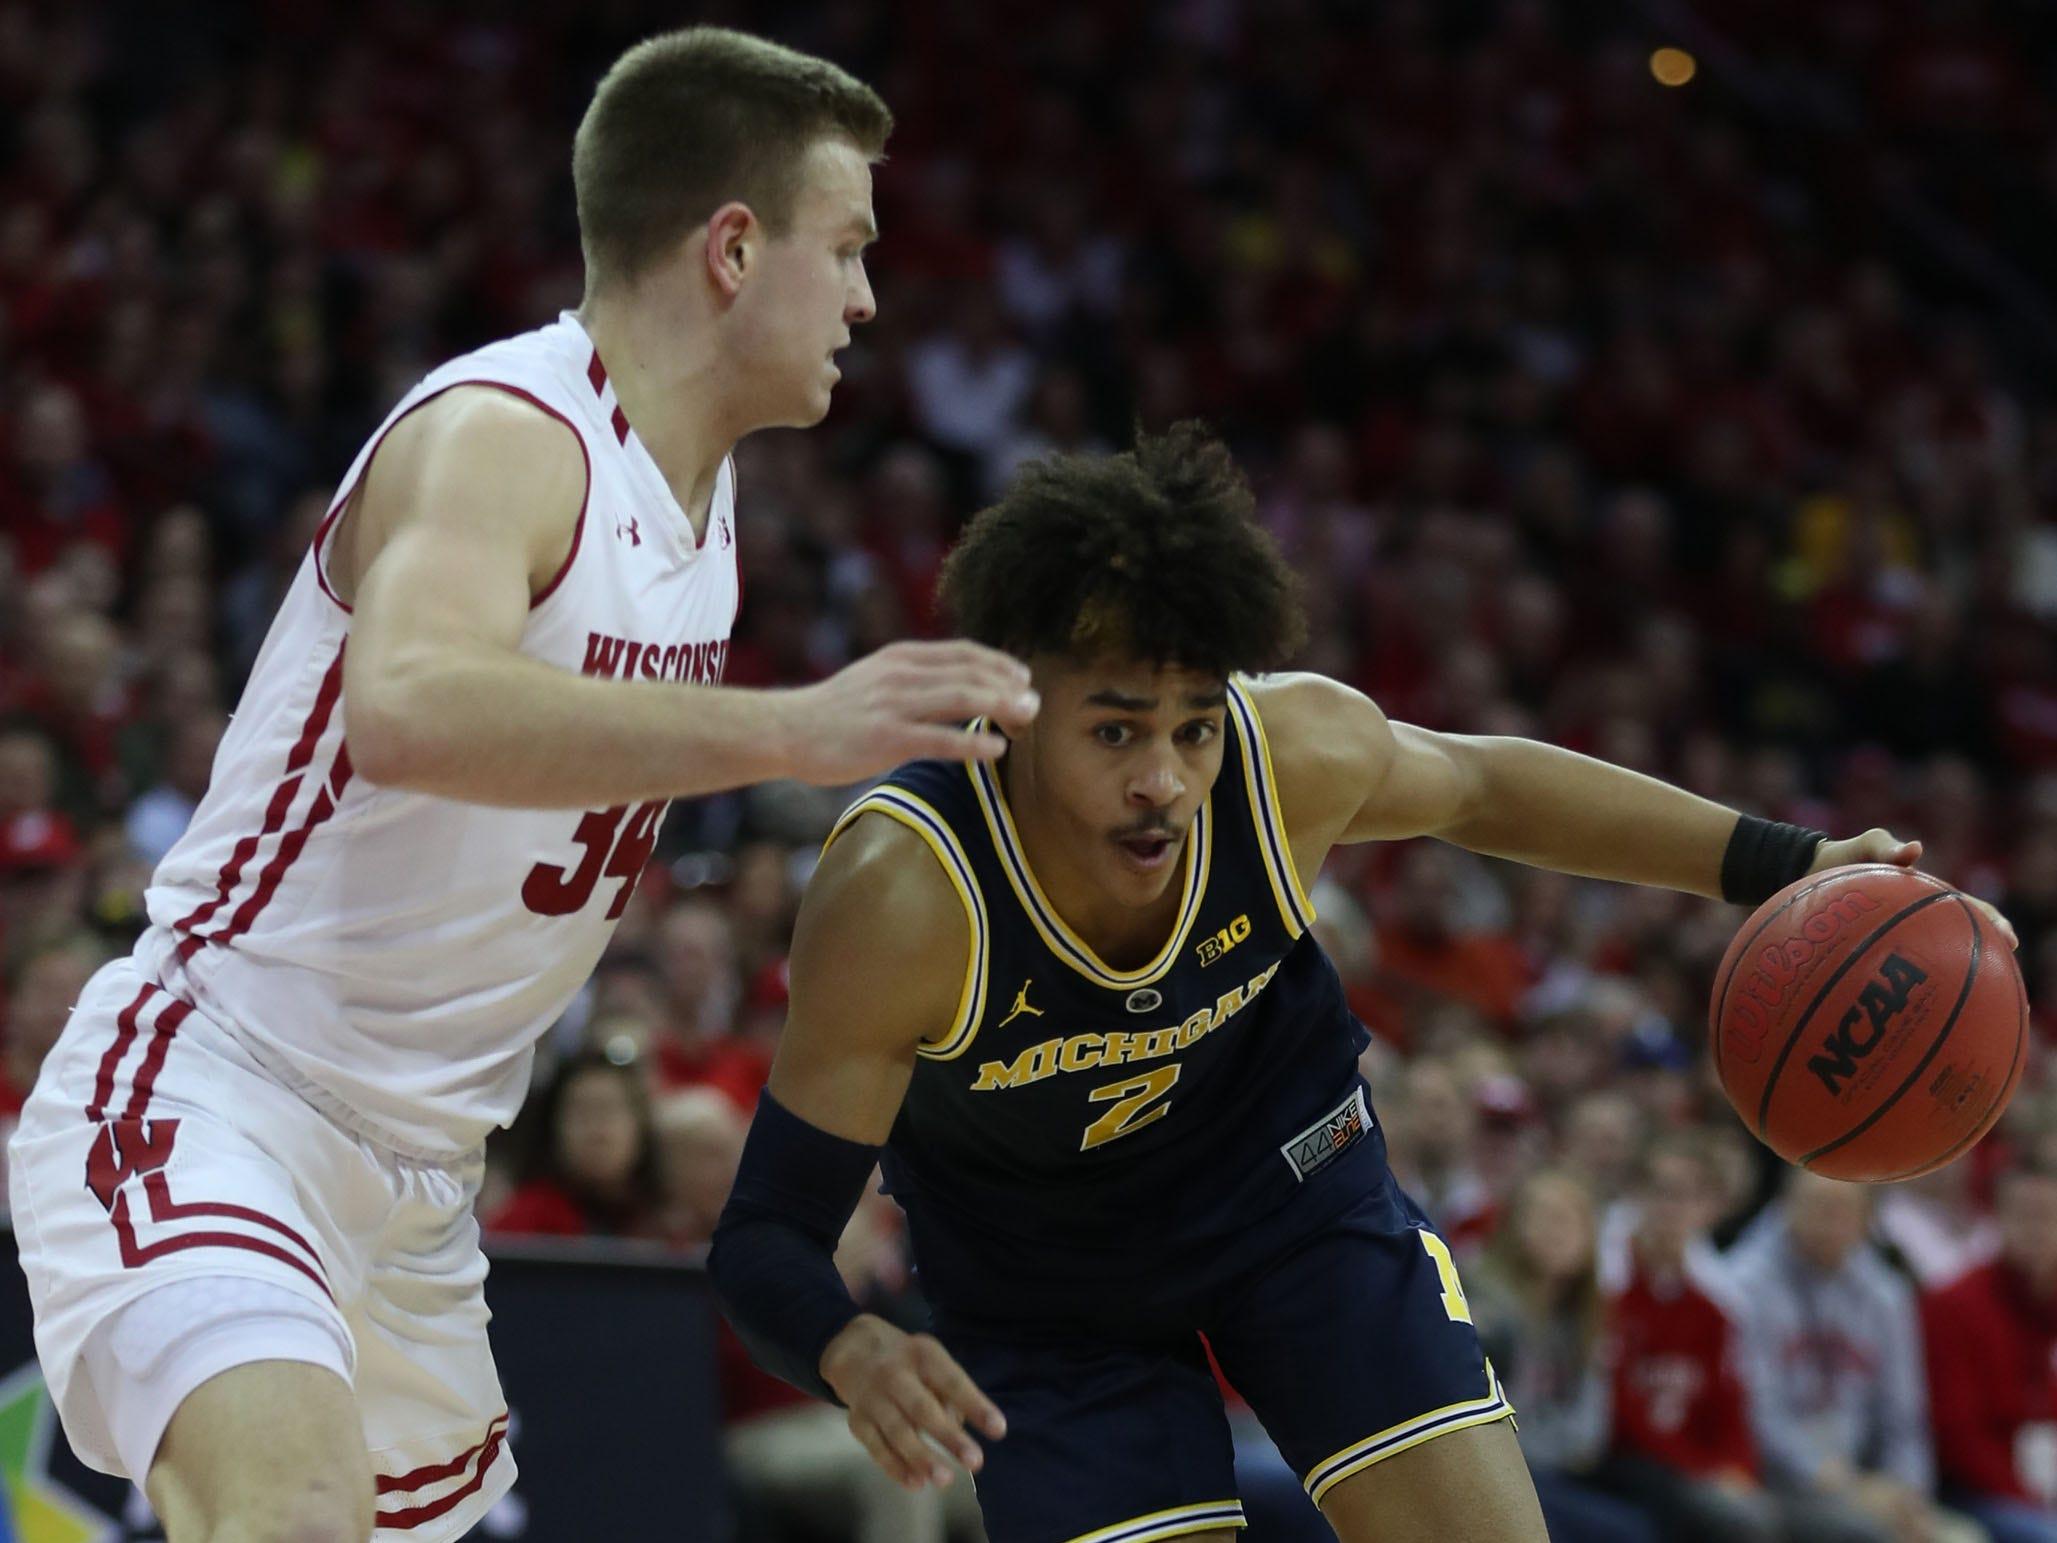 Michigan guard Jordan Poole drives against Wisconsin guard Brad Davison, Jan. 19, 2019 in Madison, Wisc.